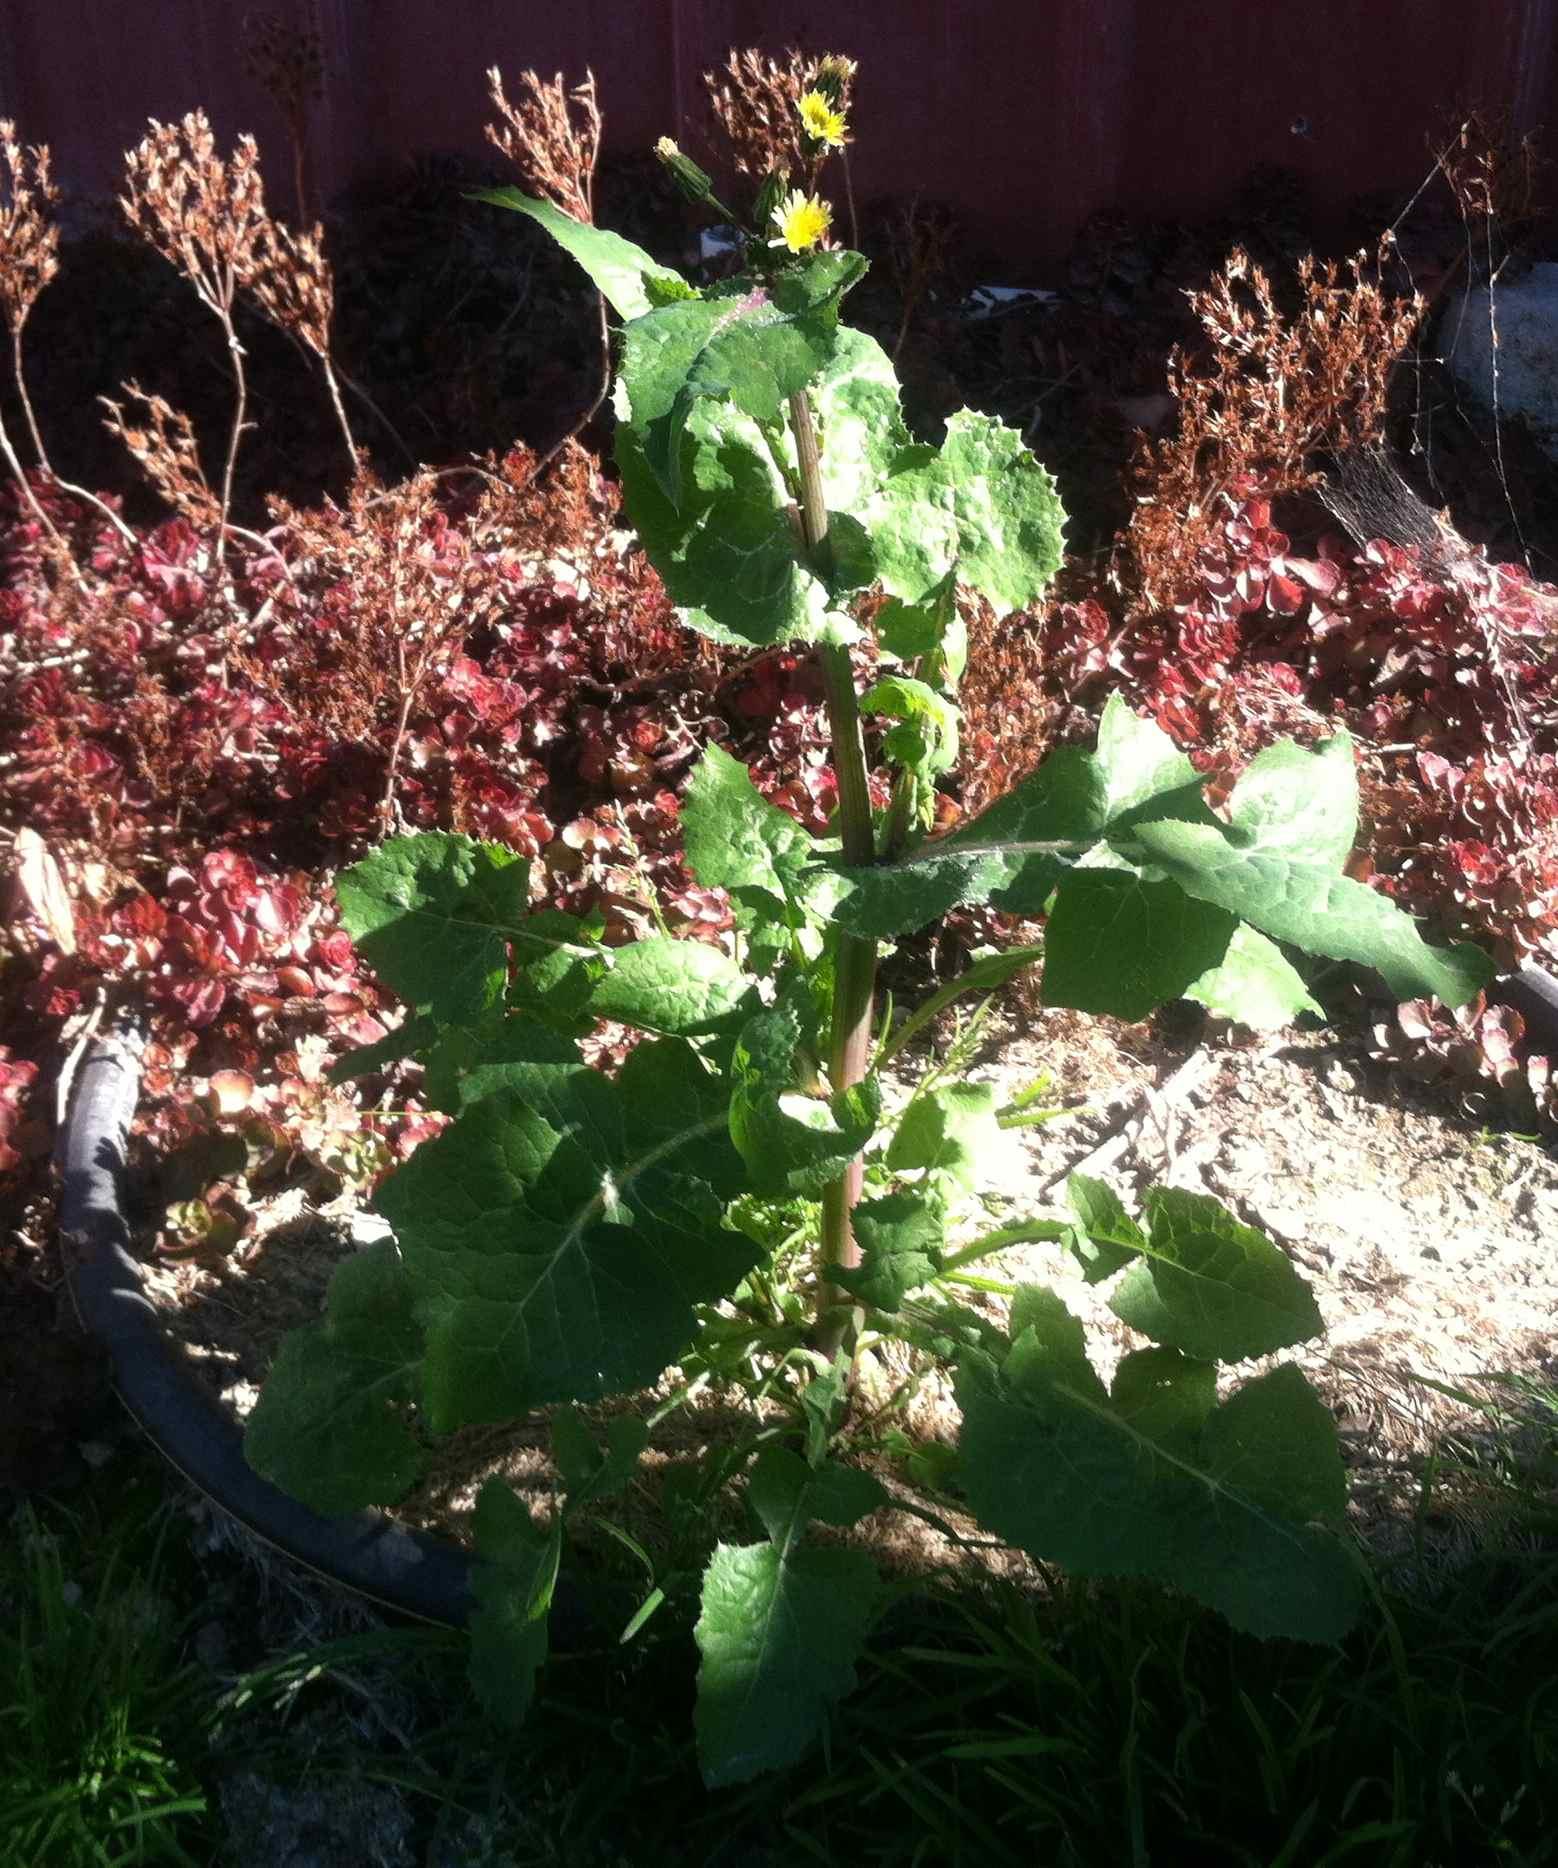 my backyard weeds u2013 smooth sow thistle